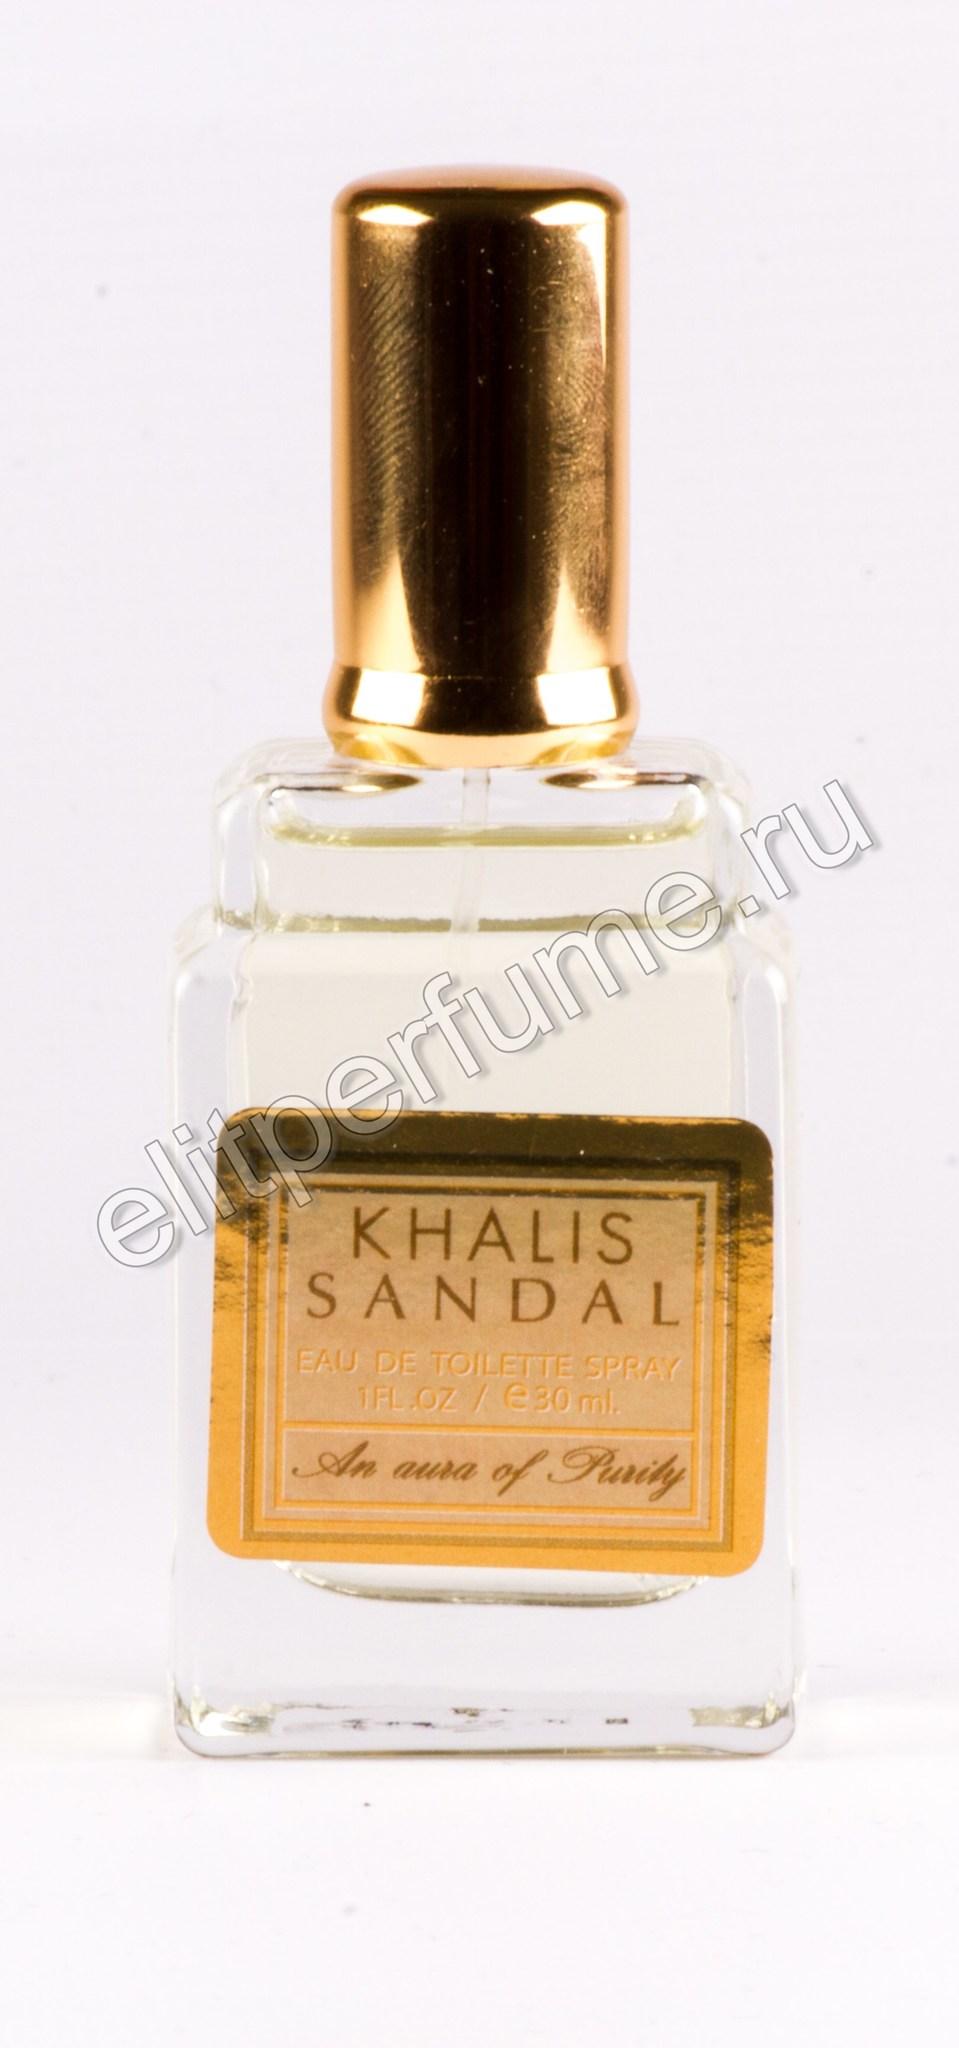 Khalis Sandal / Кхалис Cандал 30 мл спрей от Халис Khalis Perfumes